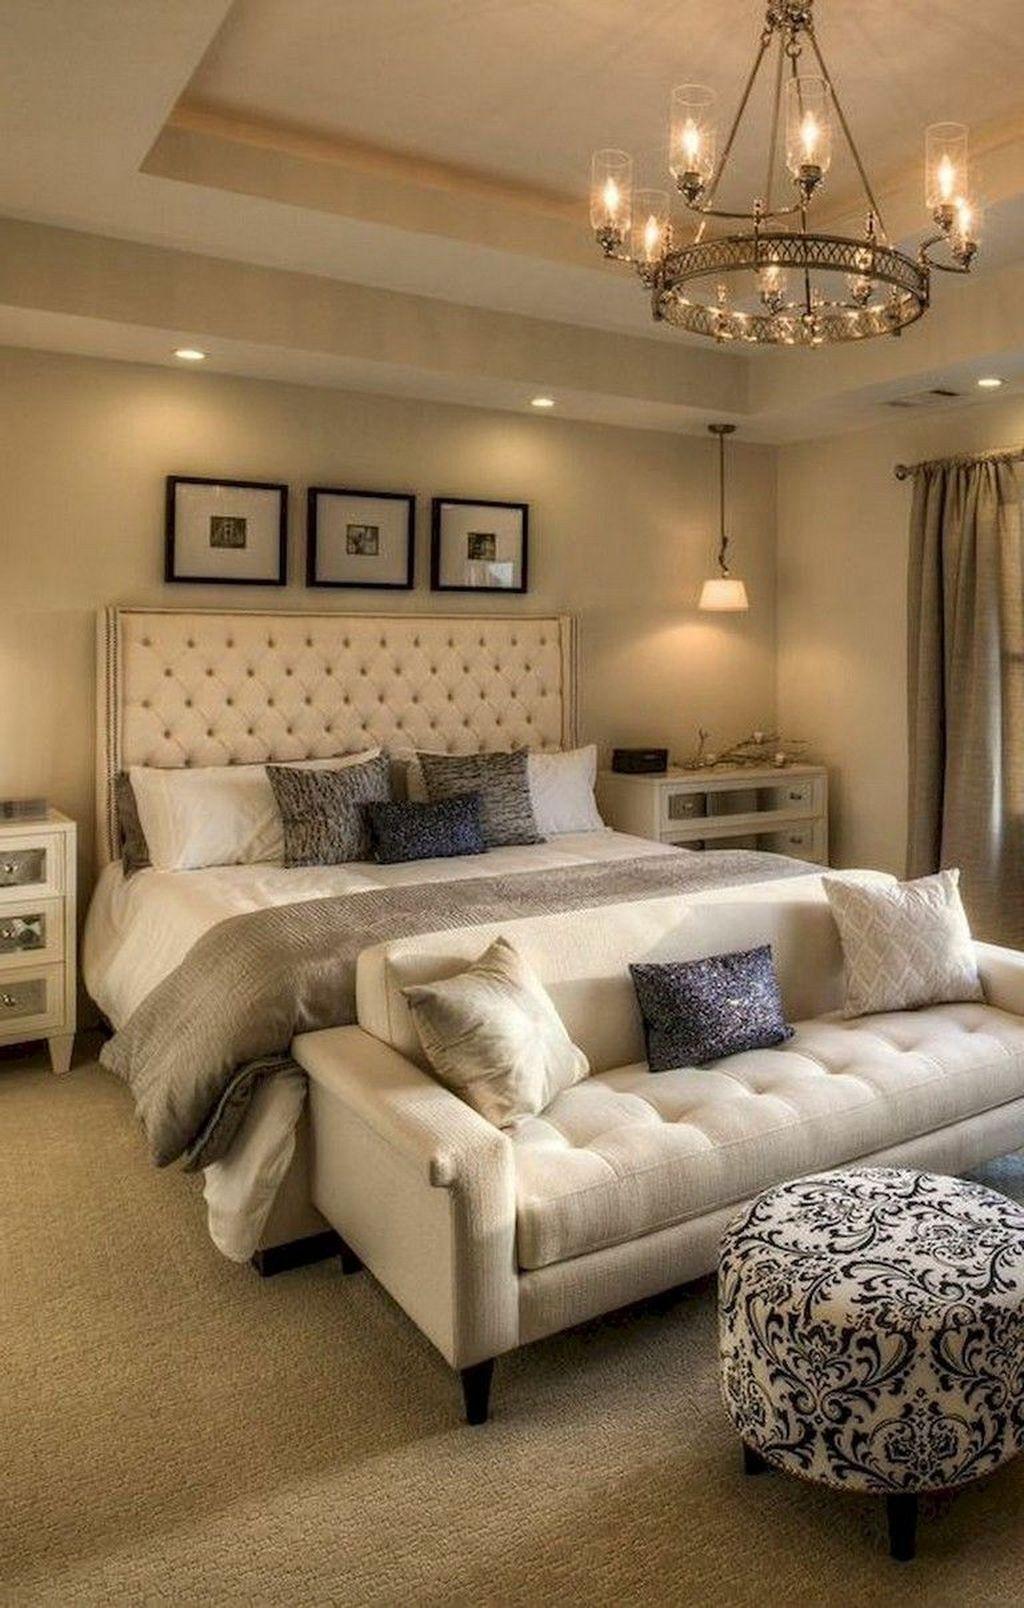 50 Perfect Elegant Bedroom Design Ideas | Bedroom decor ...